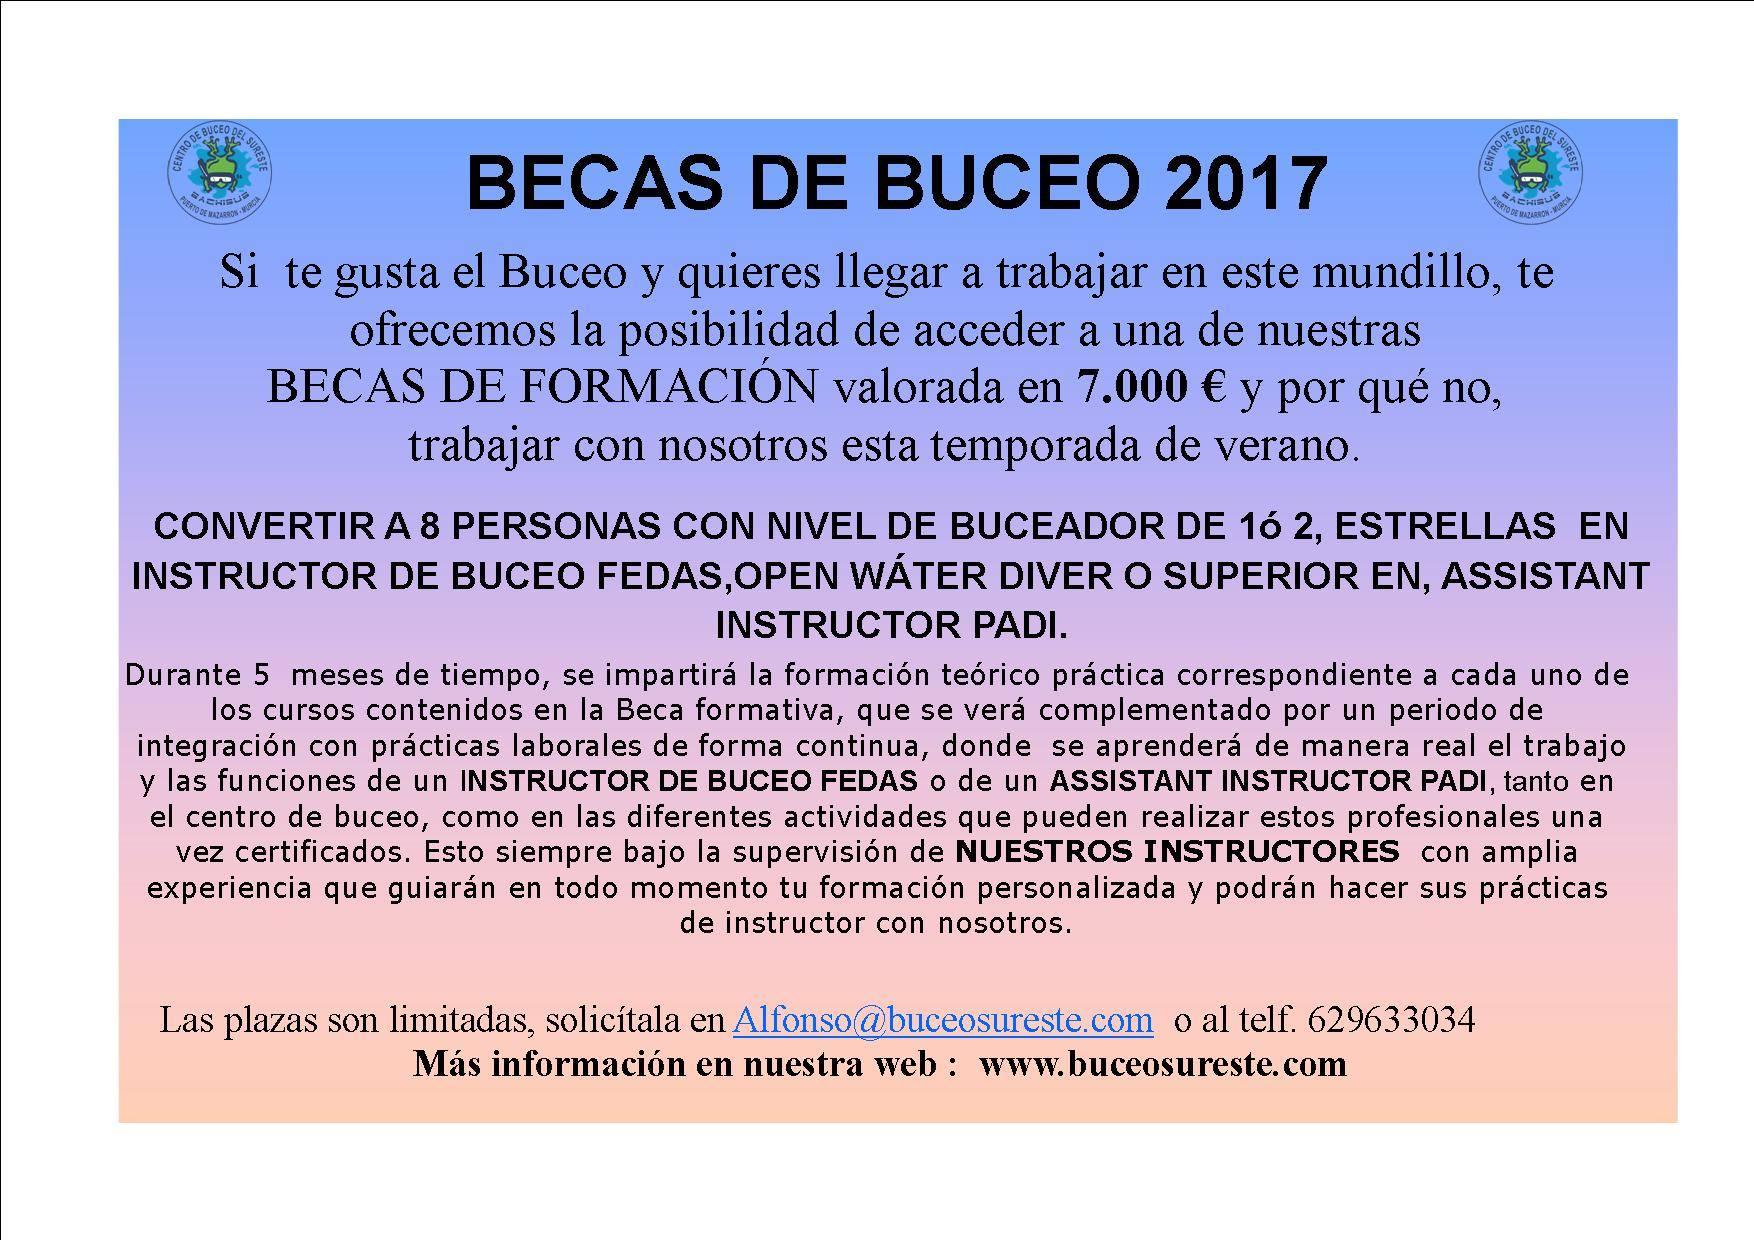 BECAS DE BUCEO 2017 Centro de Buceo del Sureste